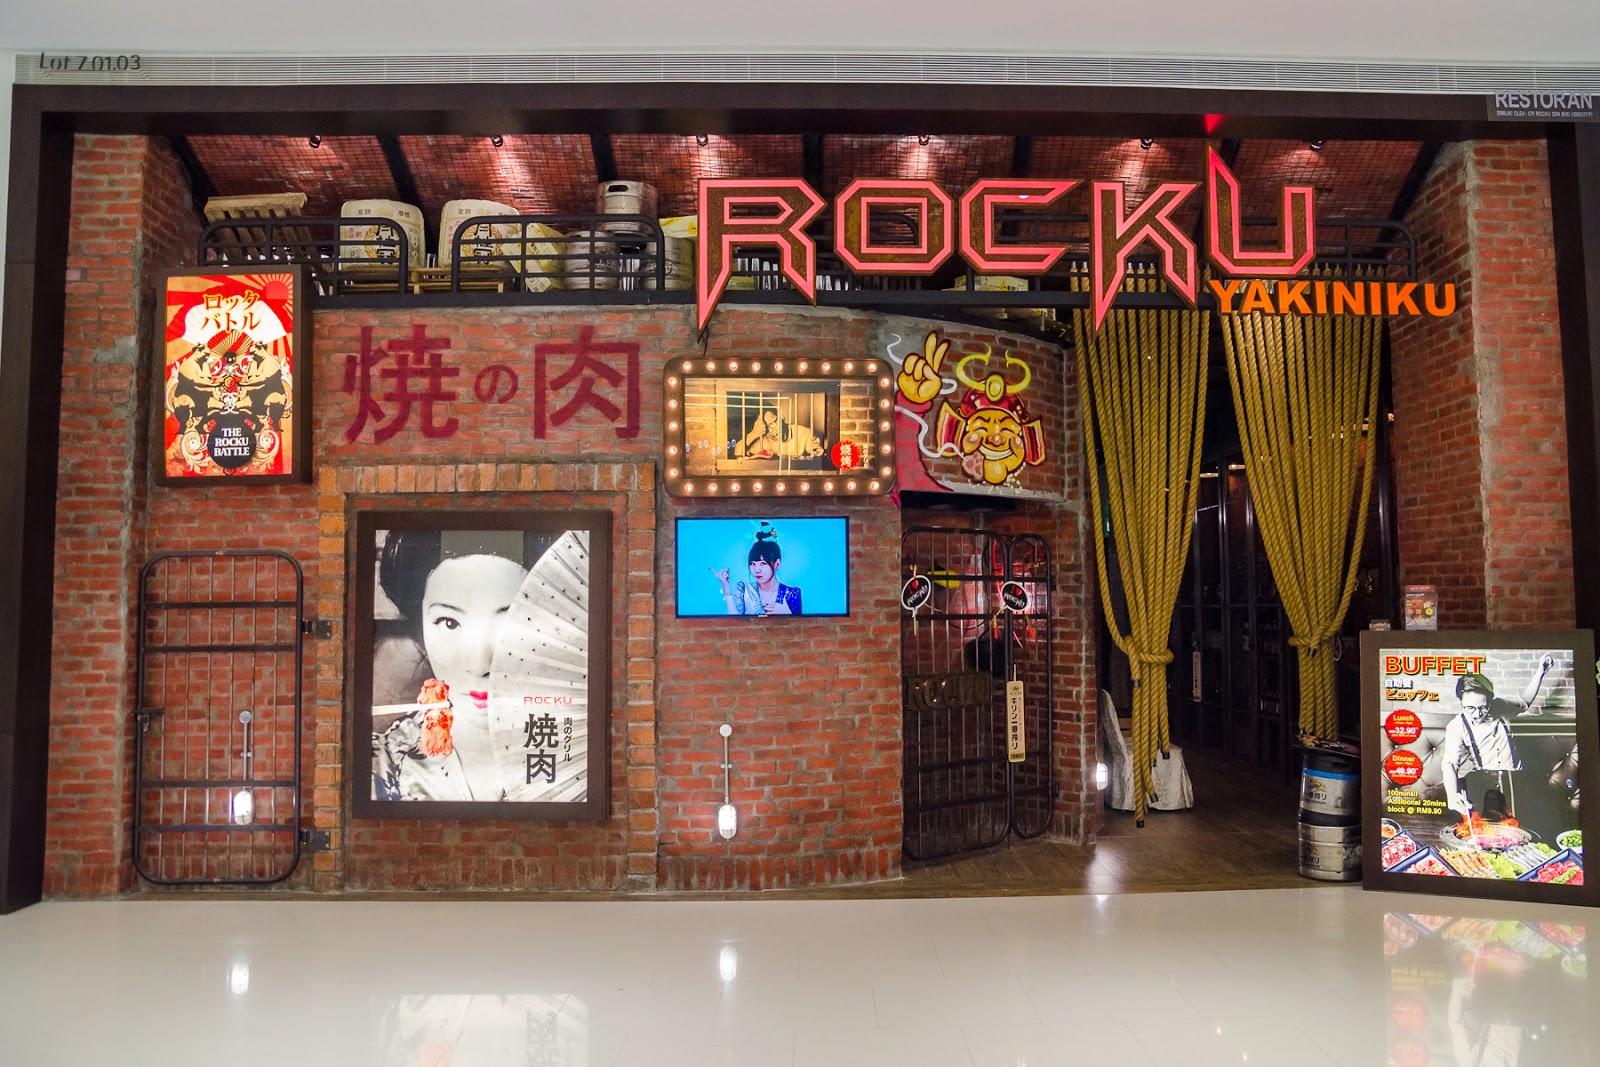 dab823e11 ROCKU Yakiniku brings you a new culinary trend - Restaurantainment ...